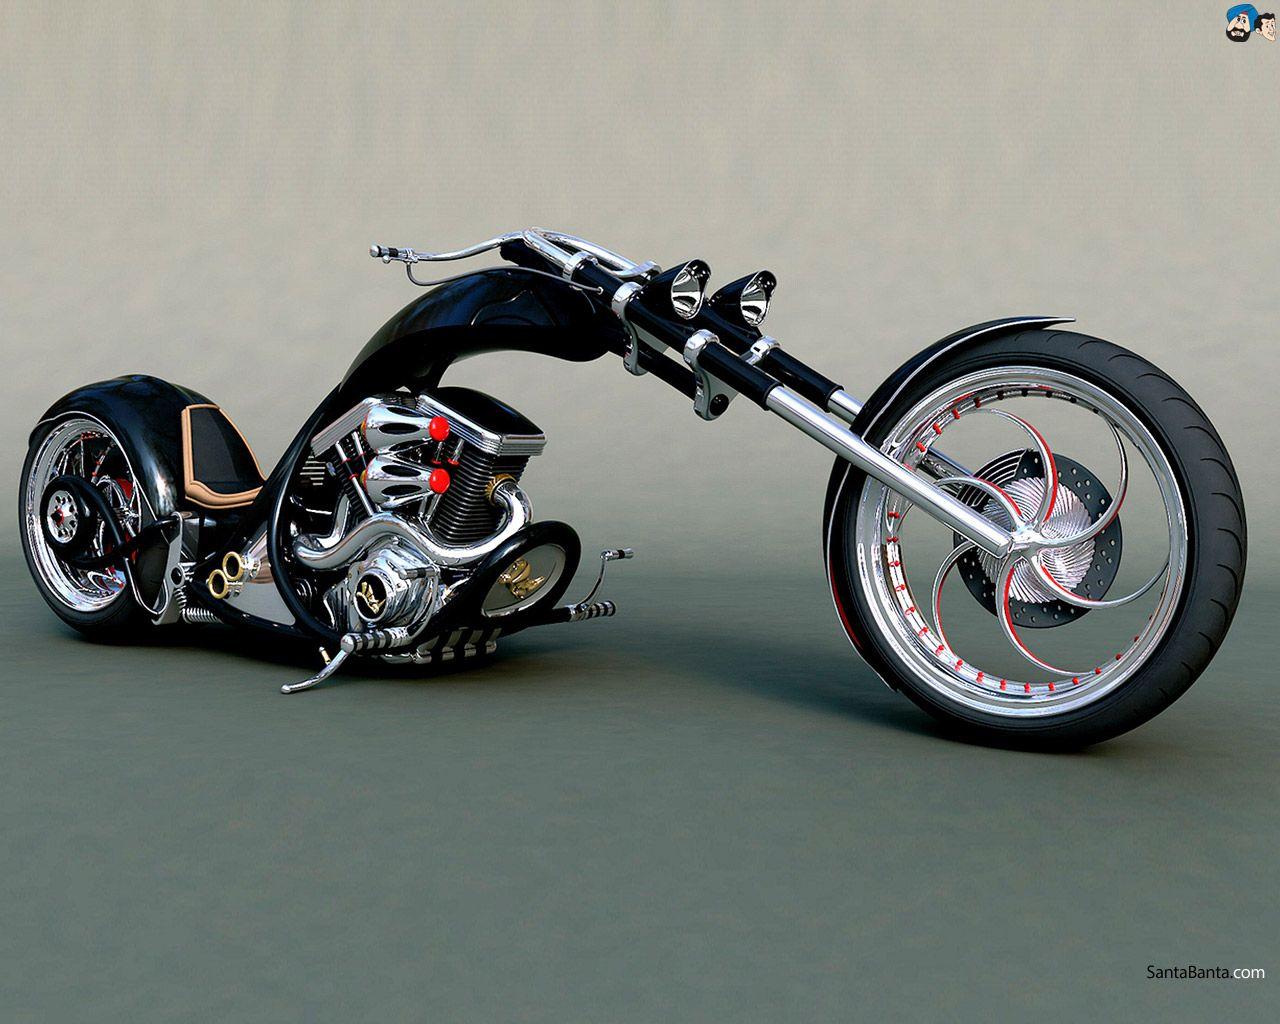 chopper vehicles motorbikes - photo #26